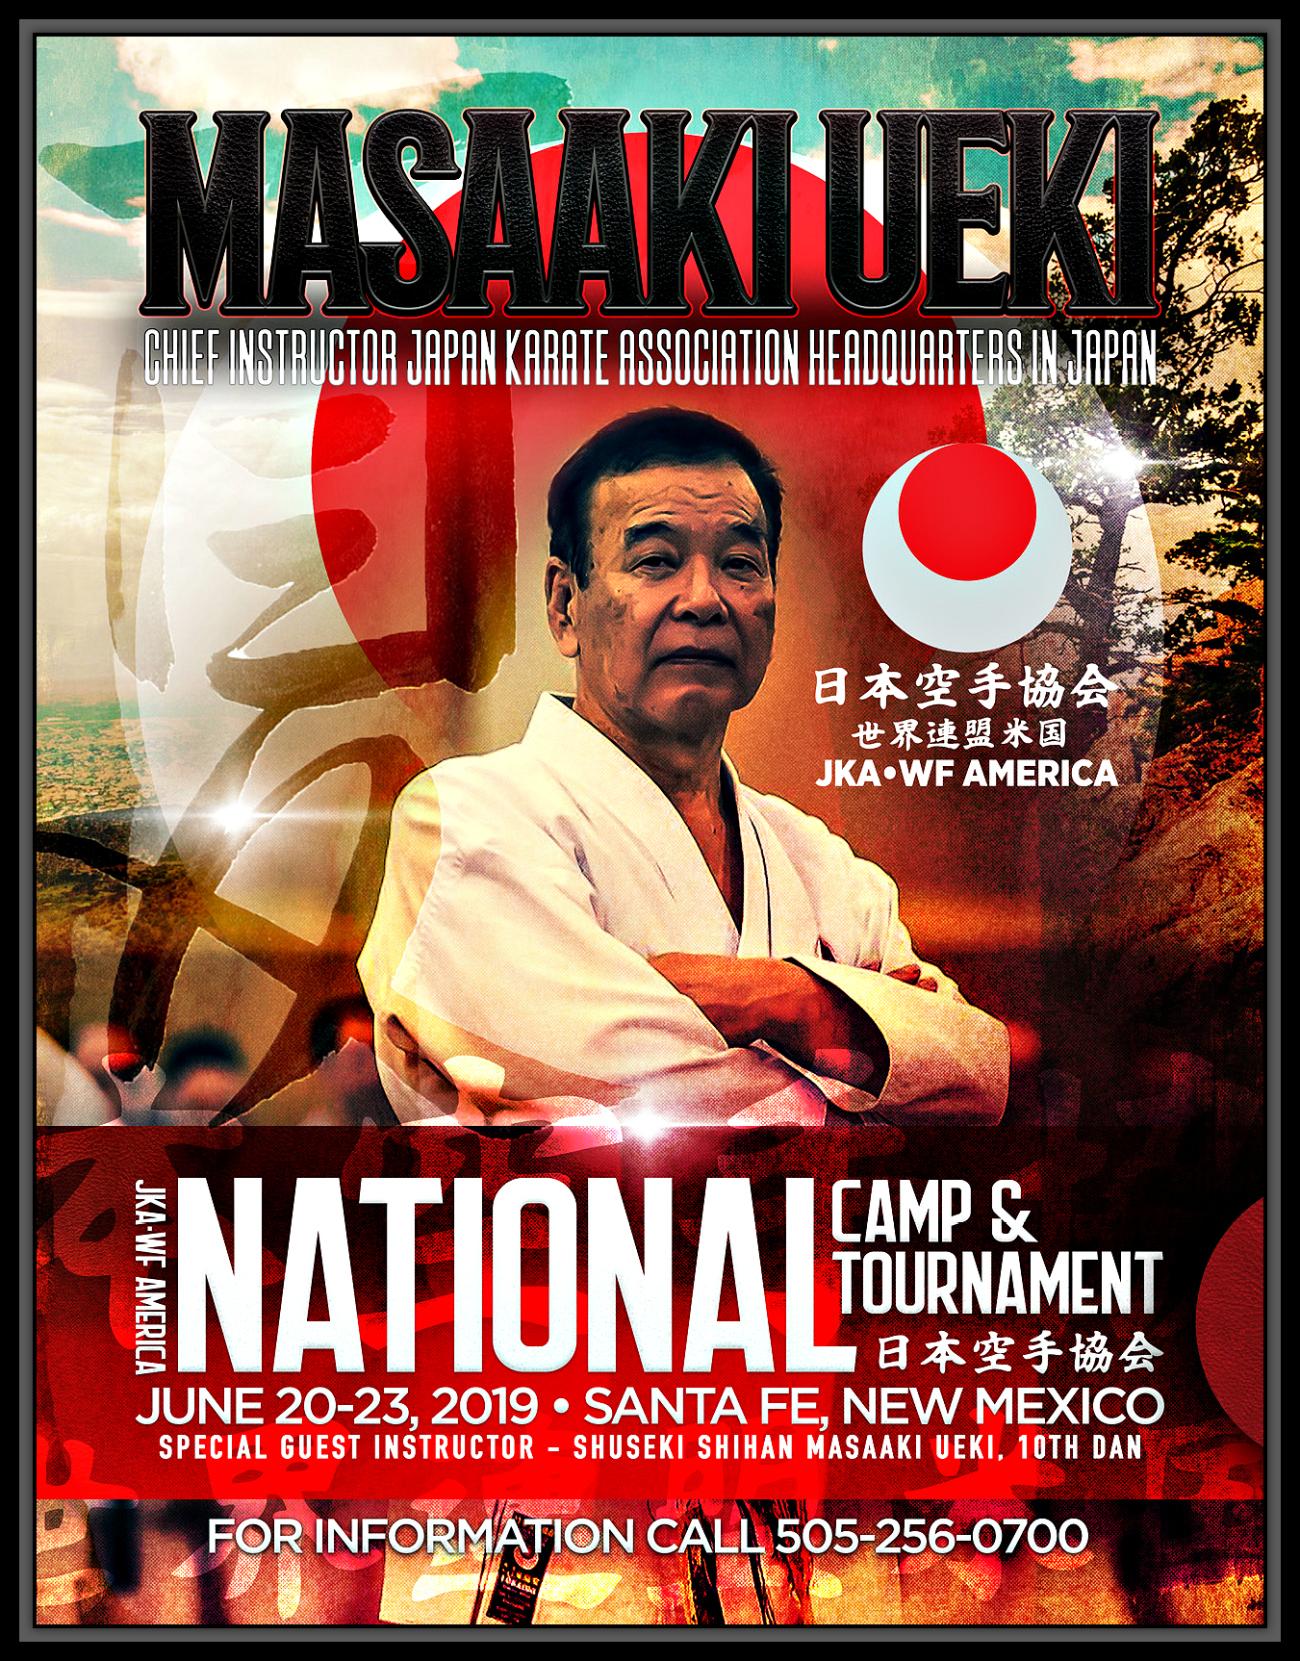 National Camp & Tournament: June 20-23, 2019   Shotokan